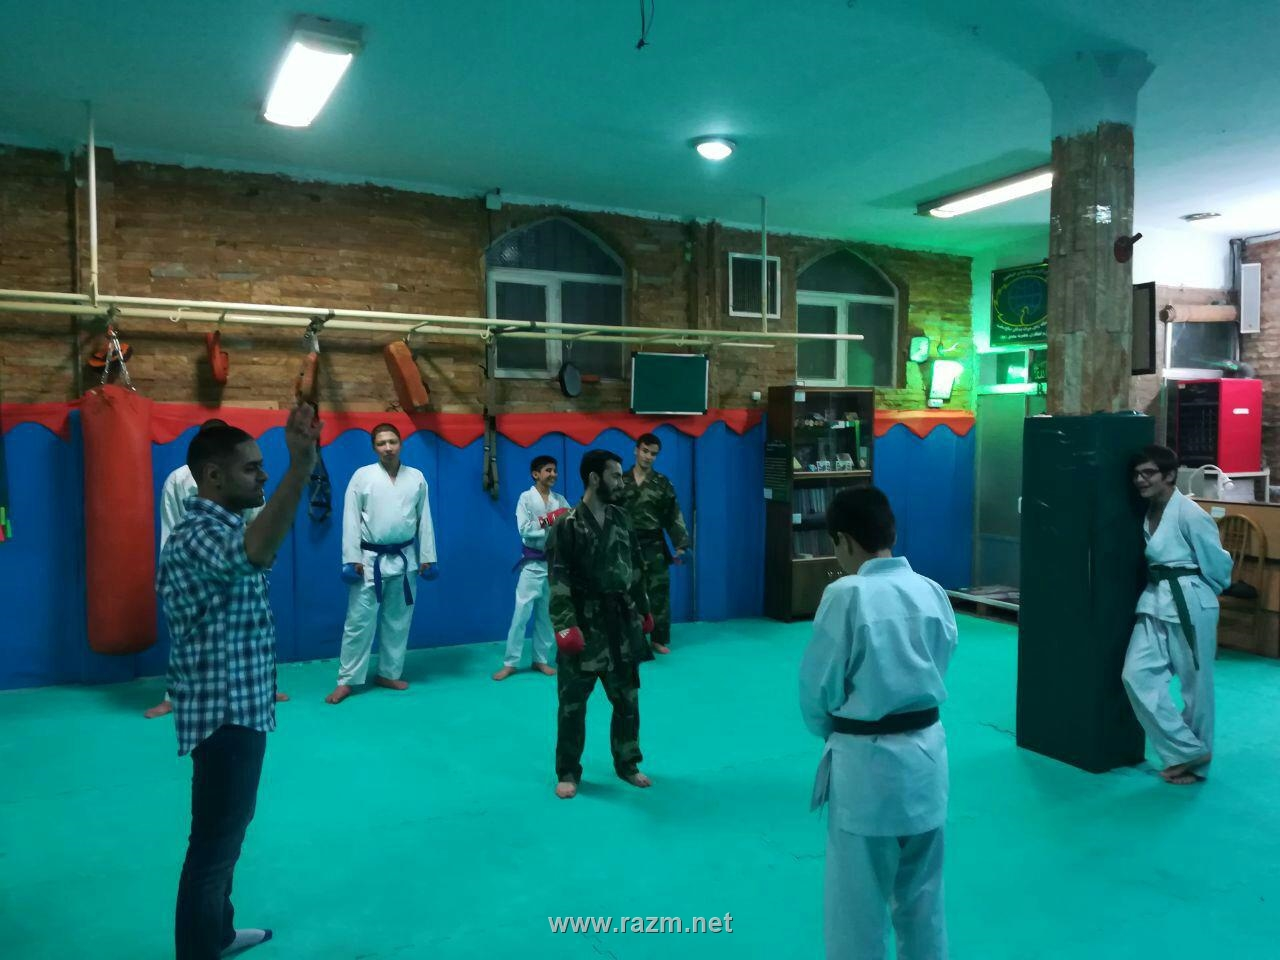 کلاس کاراته و رزمی جوانان